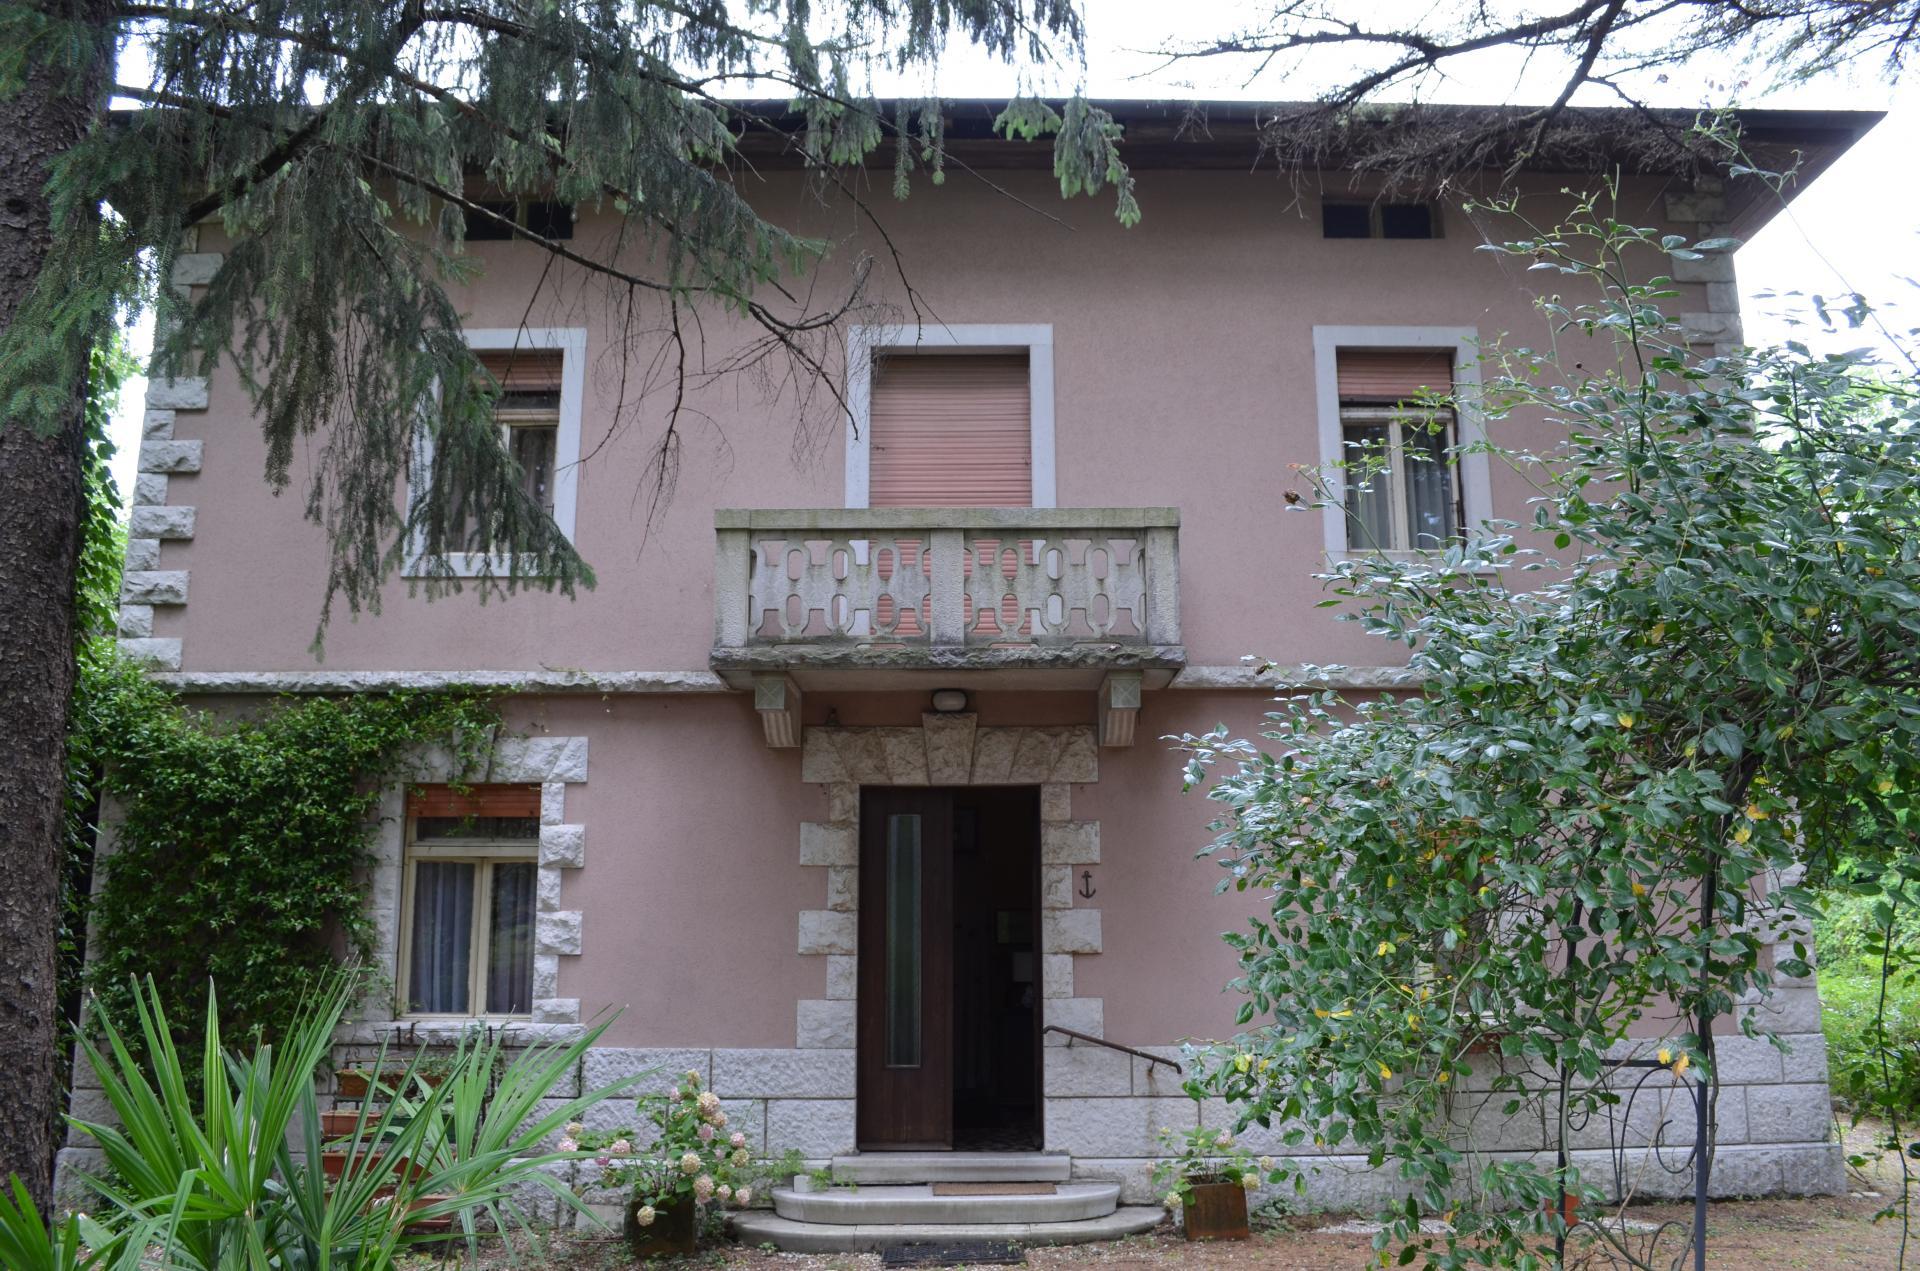 Villa d'epoca / indipendente in Vendita a Savogna d'Isonzo